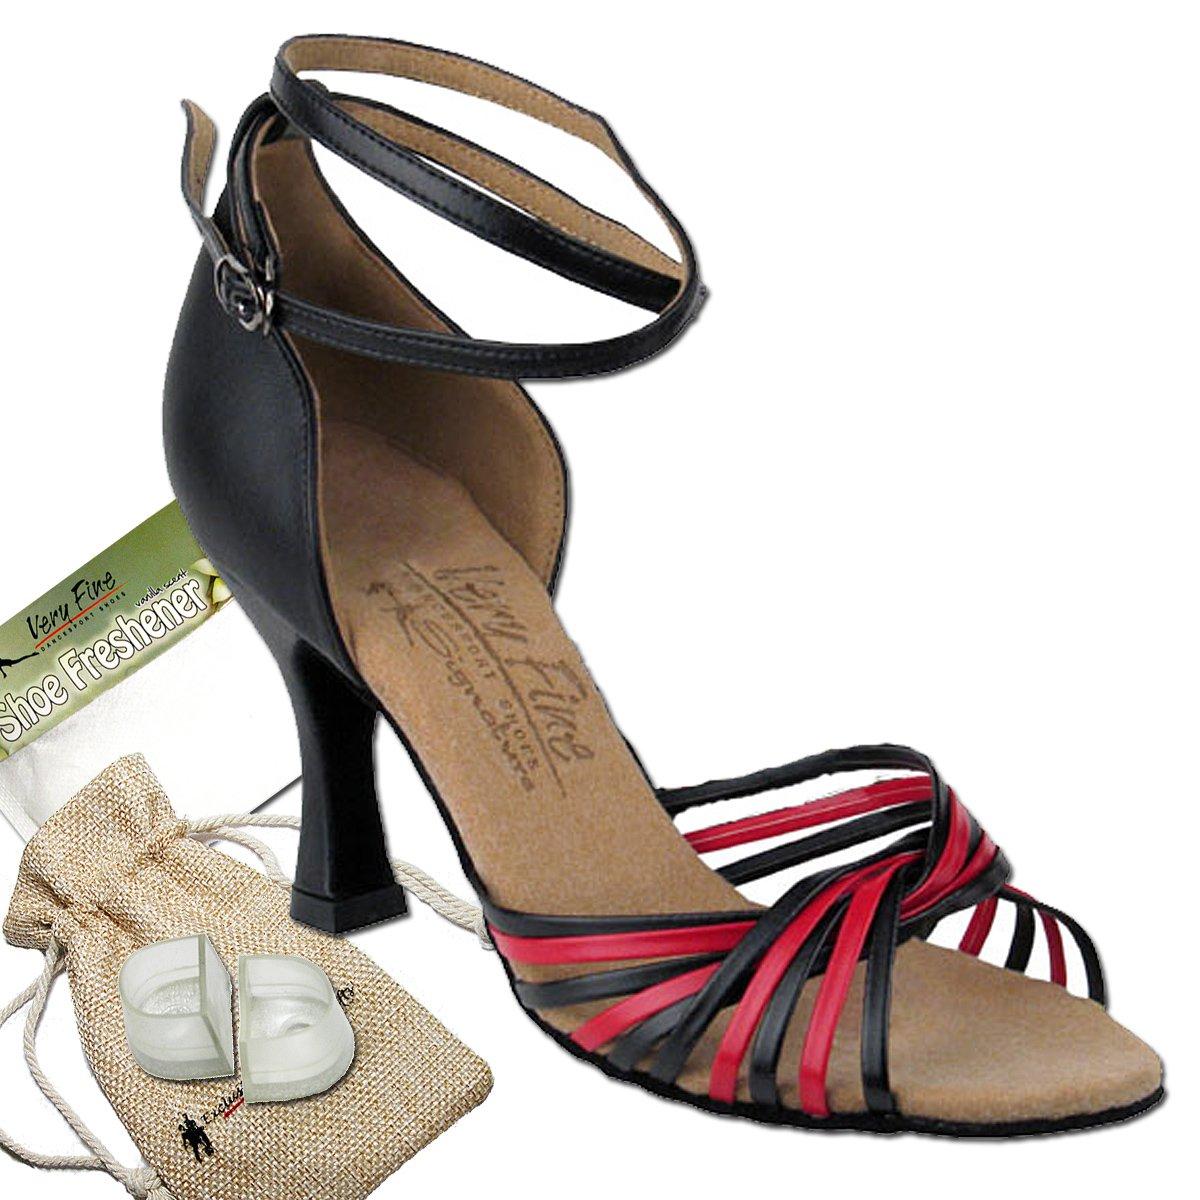 Women's Ballroom Dance Shoes Tango Wedding Salsa Dance Shoes Black Leather & Red Leather S1001EB Comfortable - Very Fine 3'' Heel 9.5 M US [Bundle 5]